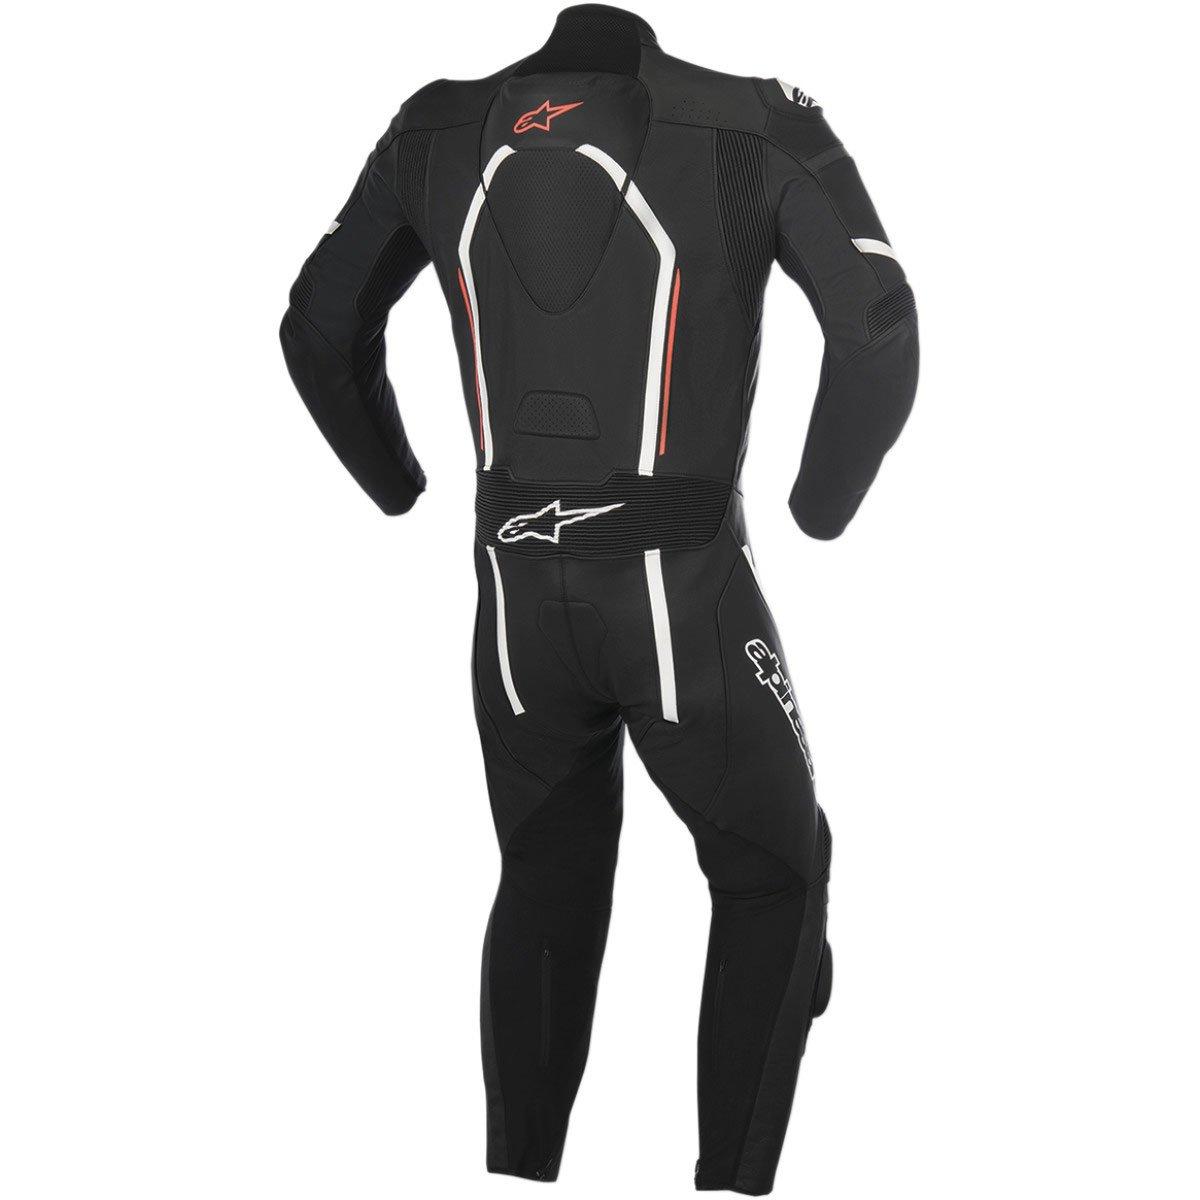 Alpinestars Montegi V2 Men's 1-Piece Street Motorcycle Race Suits - Black/White/Red / 56 by Alpinestars (Image #1)